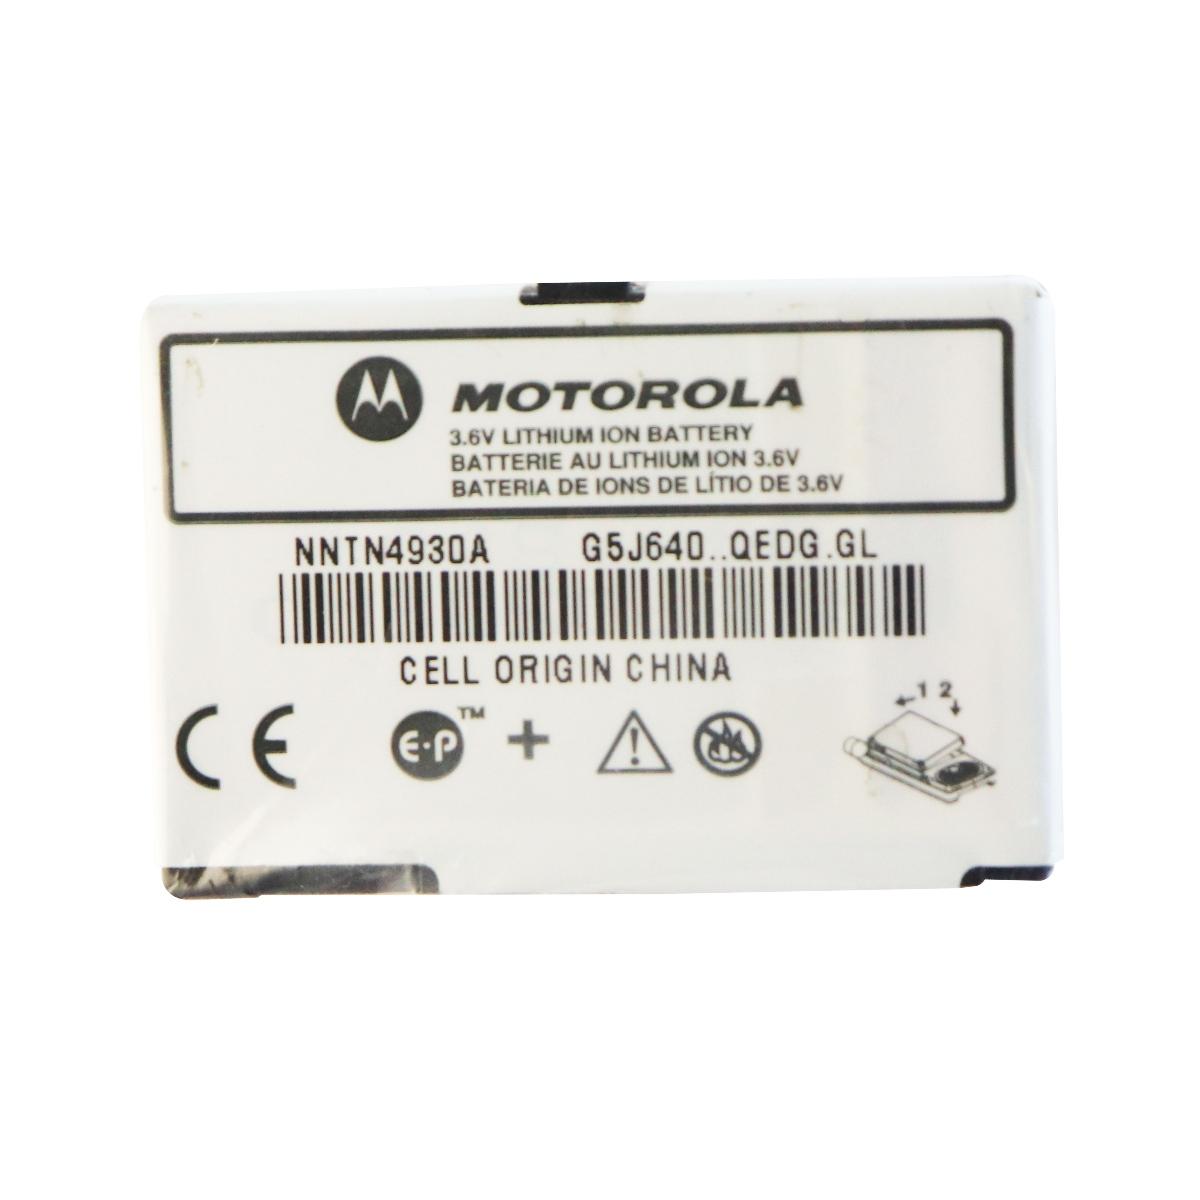 OEM Motorola 3.6v Lithium Ion Battery NNTN4930A for Motorola Devices - White